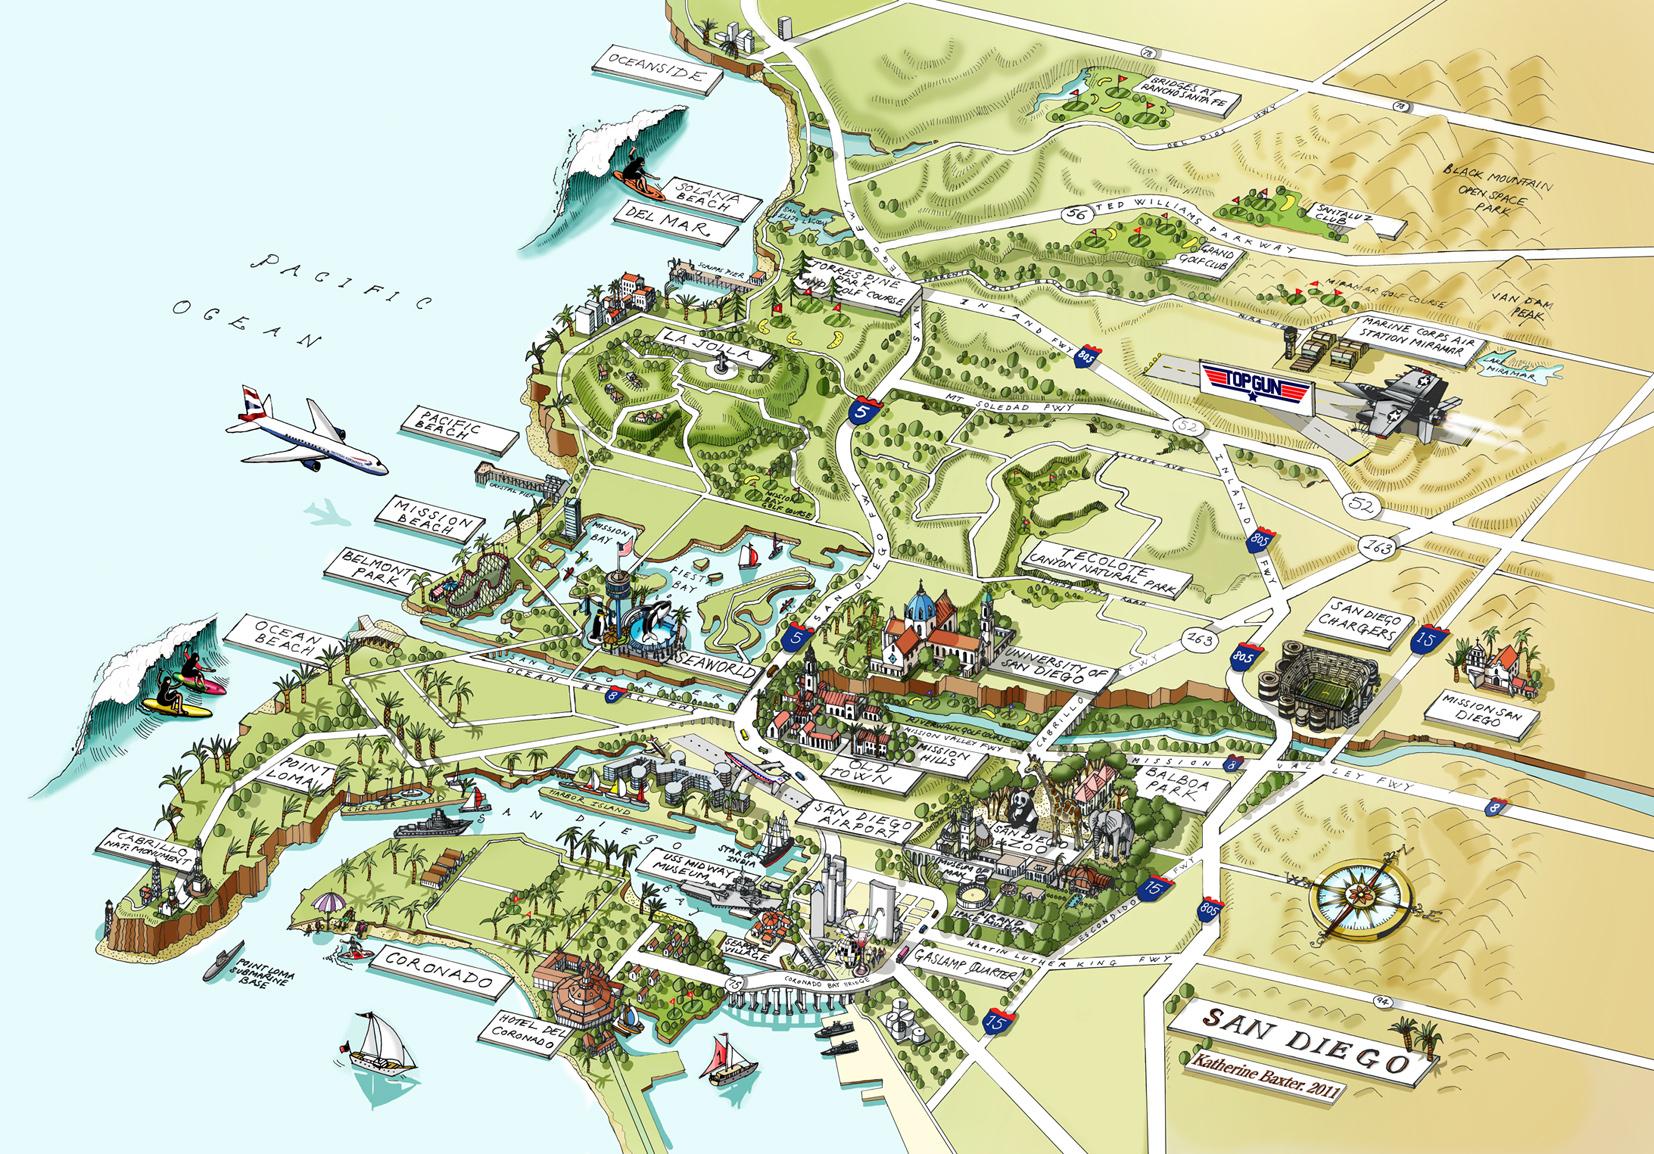 San Diego Map / Meredith